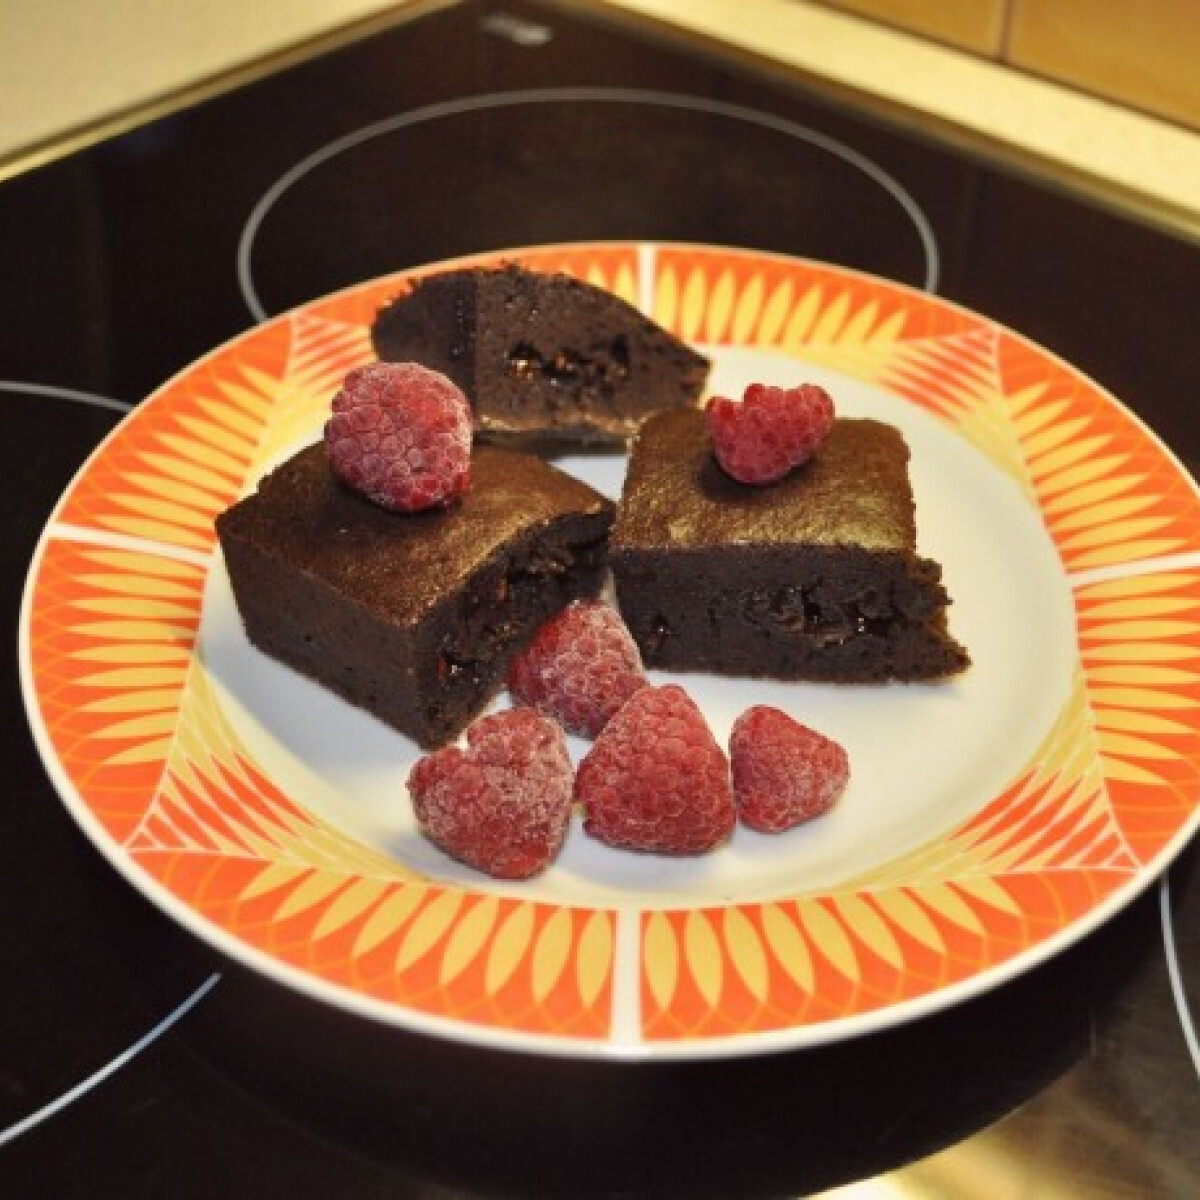 Ezen a képen: Kakaós-csokis brownie